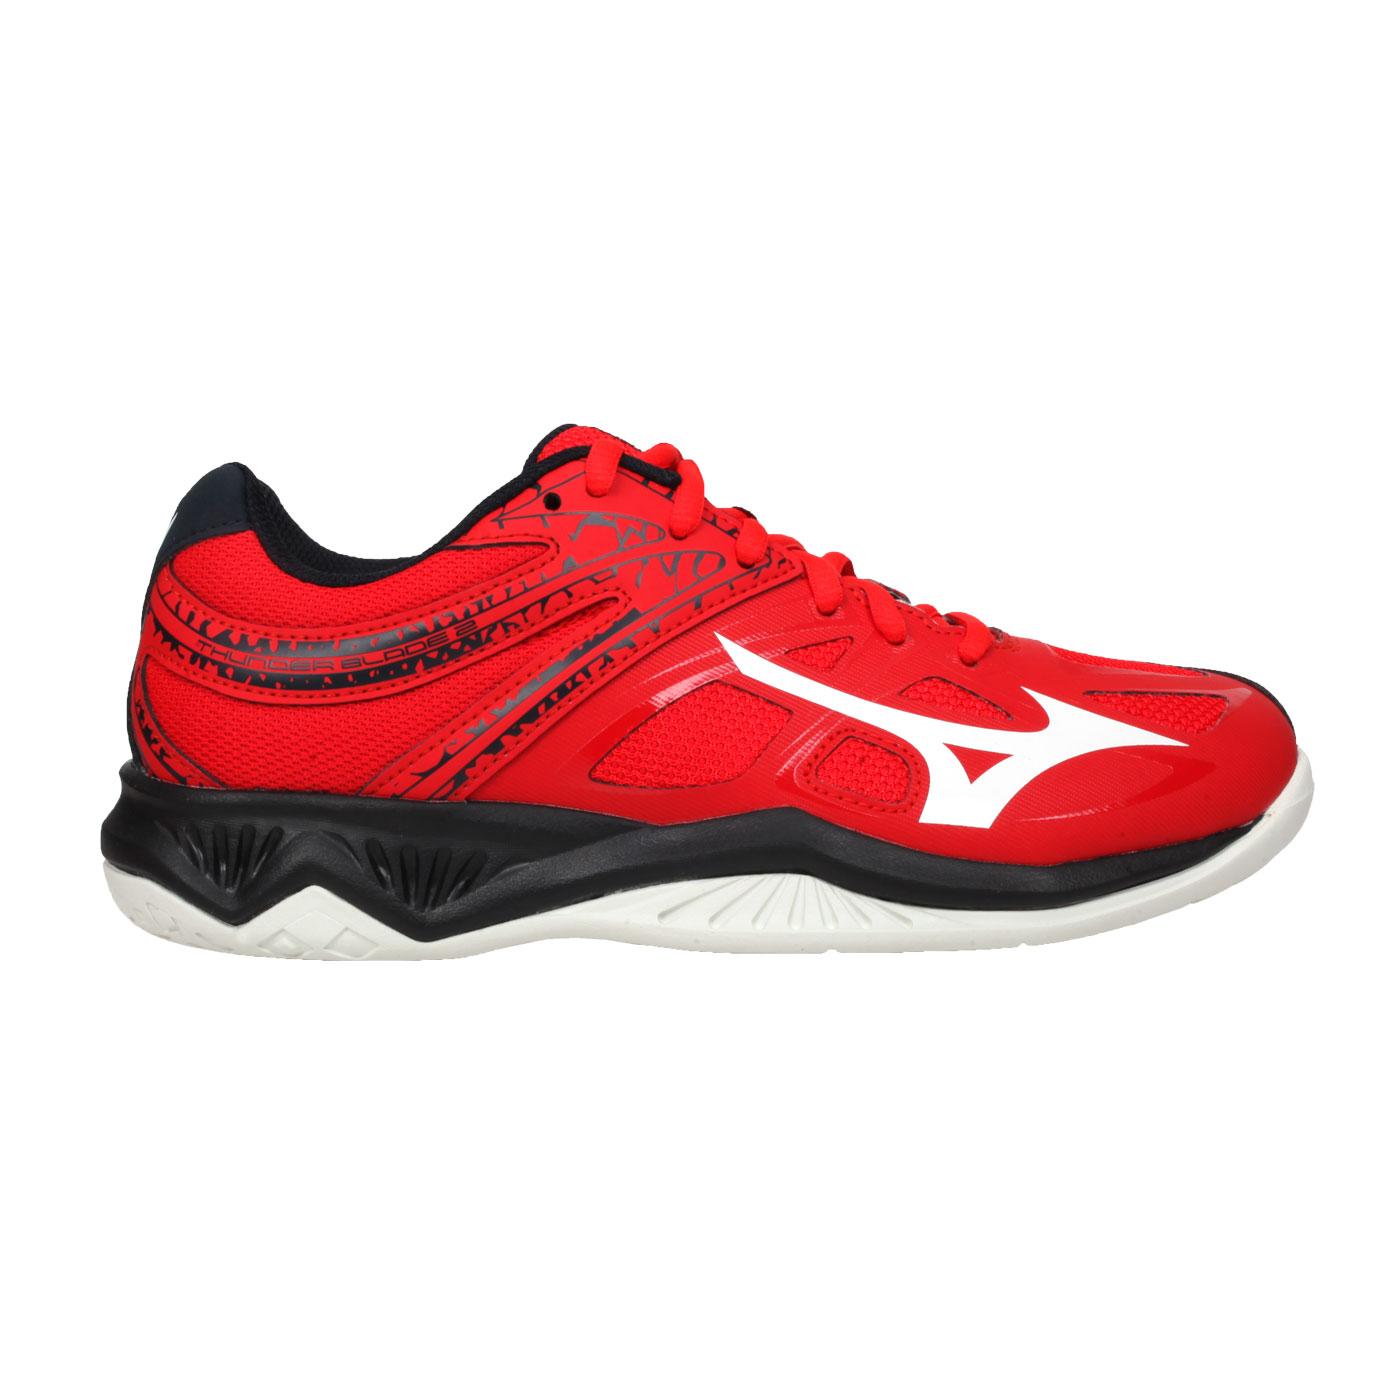 MIZUNO 排球鞋  @THUNDER BLADE 2@V1GA197063 - 紅黑白